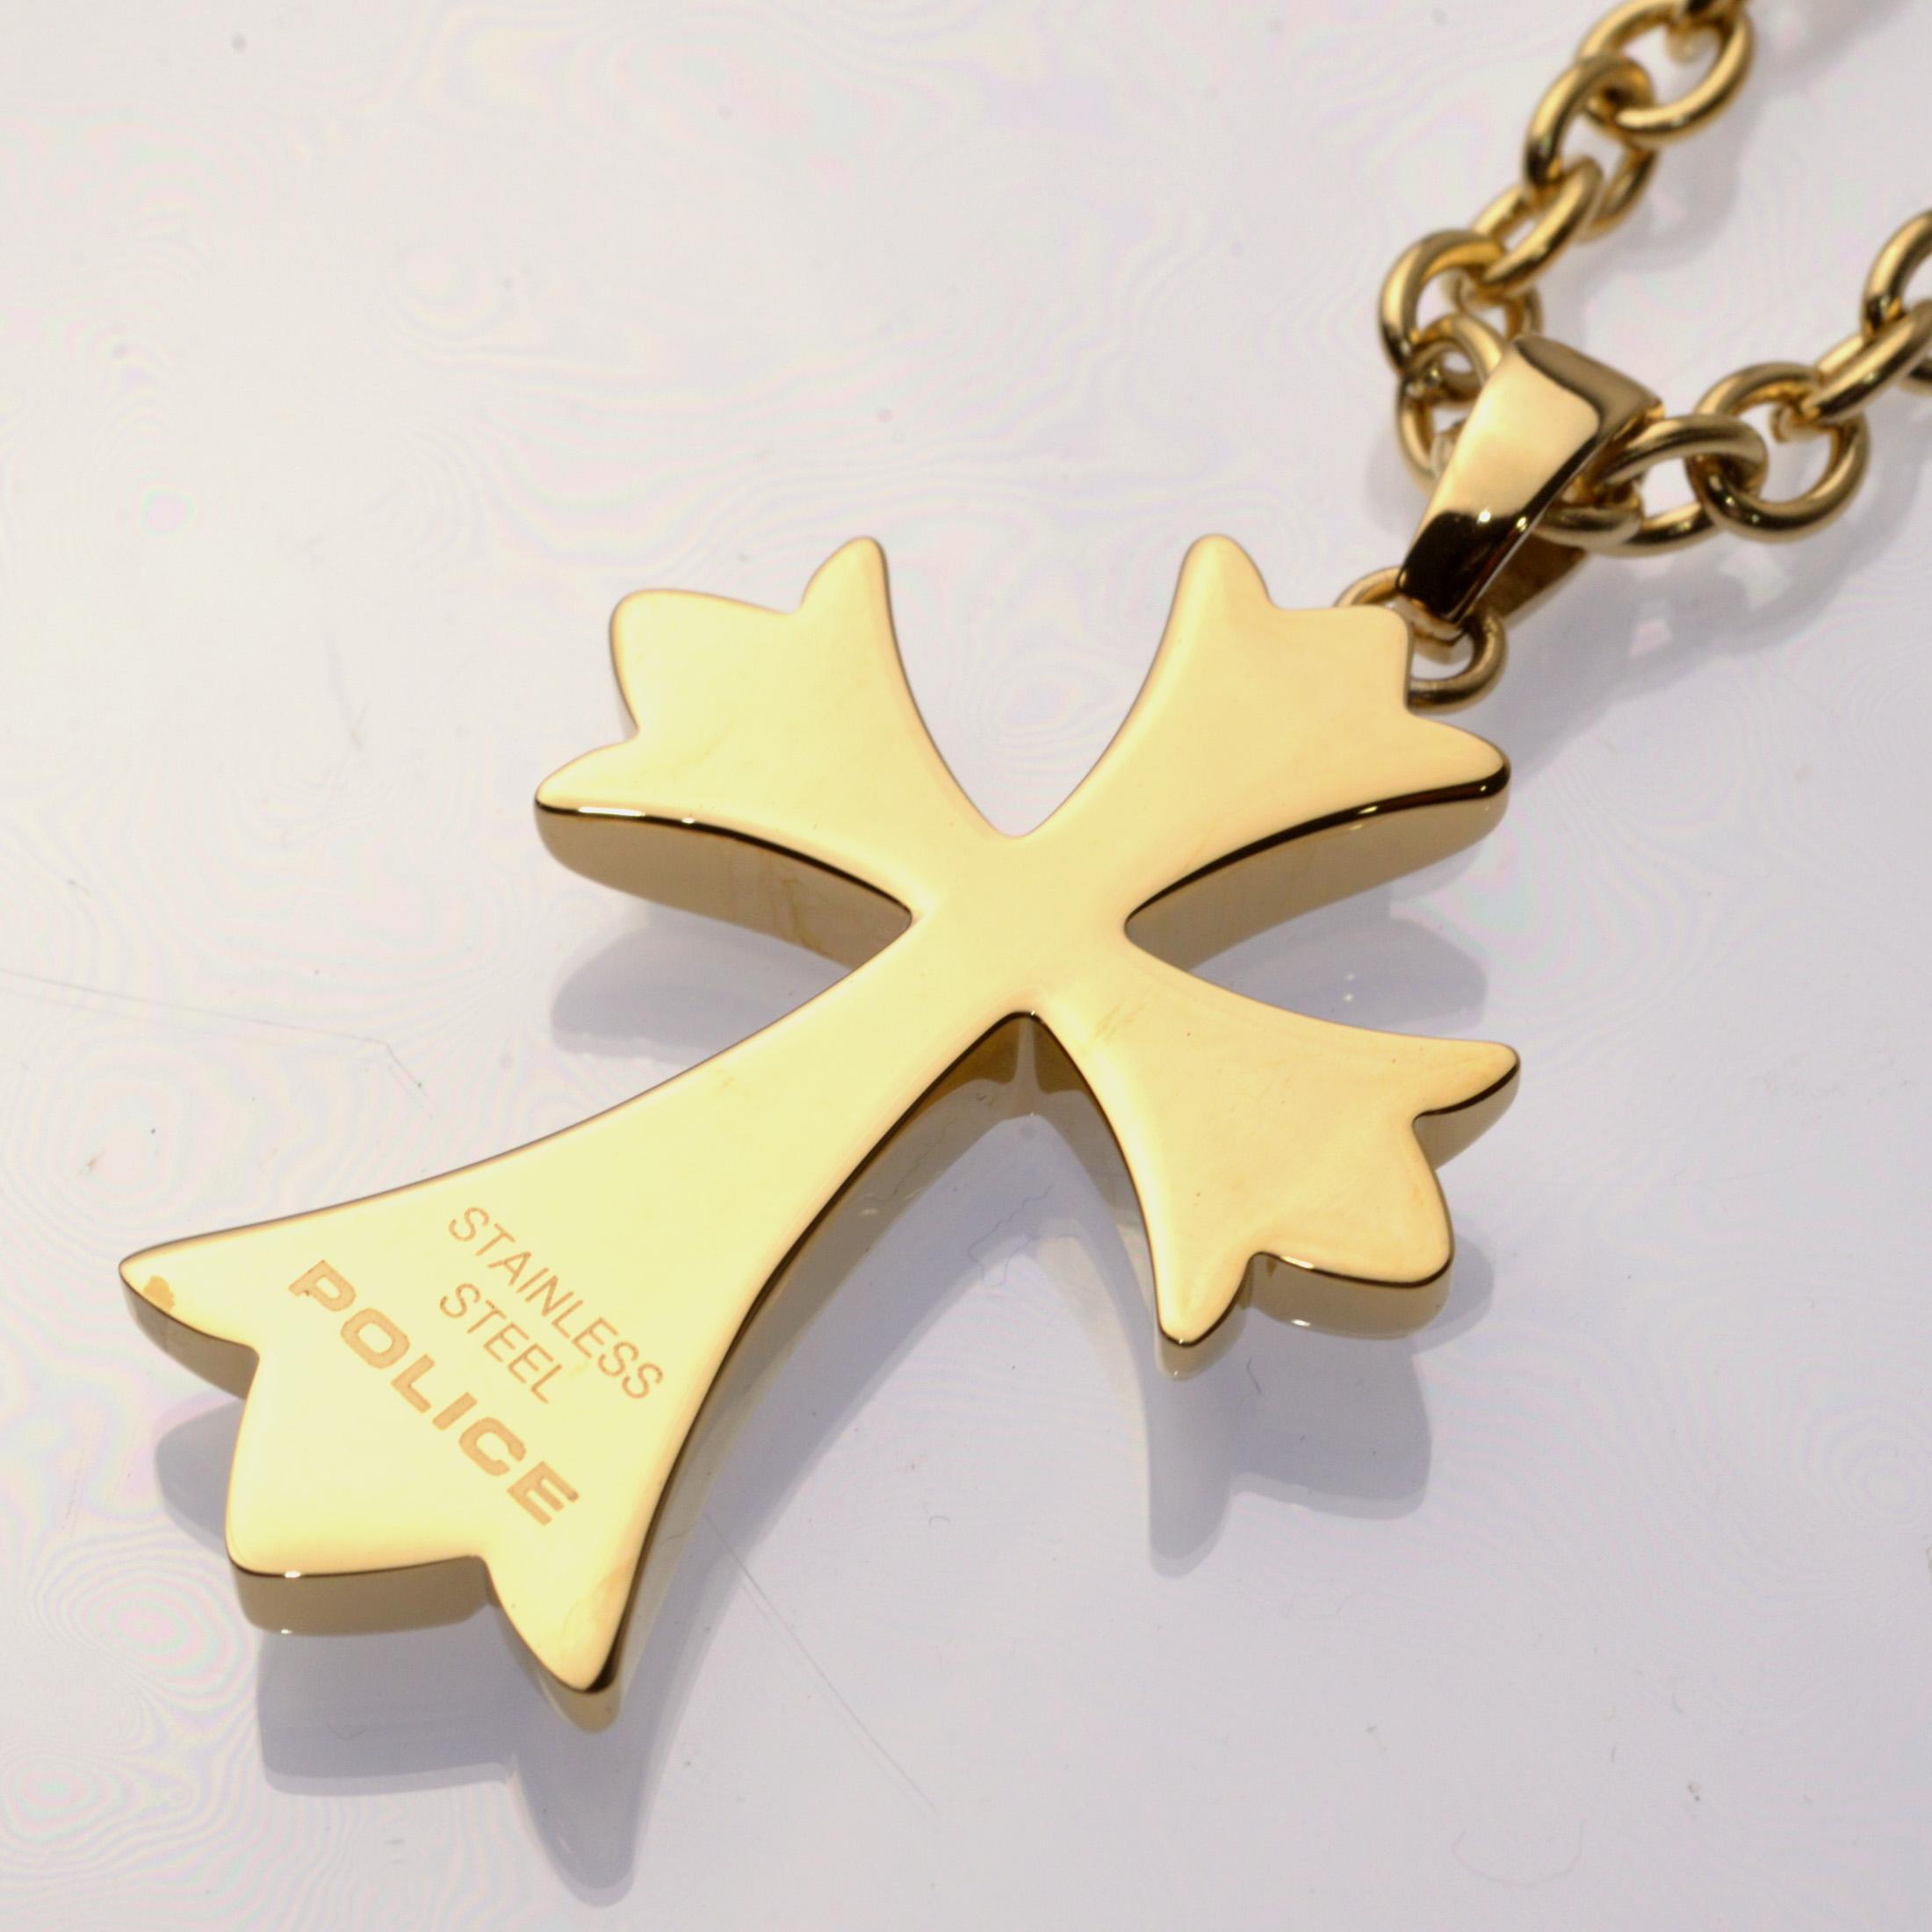 http://www.police.ne.jp/images/Police_necklace_grace_gold-02.jpg